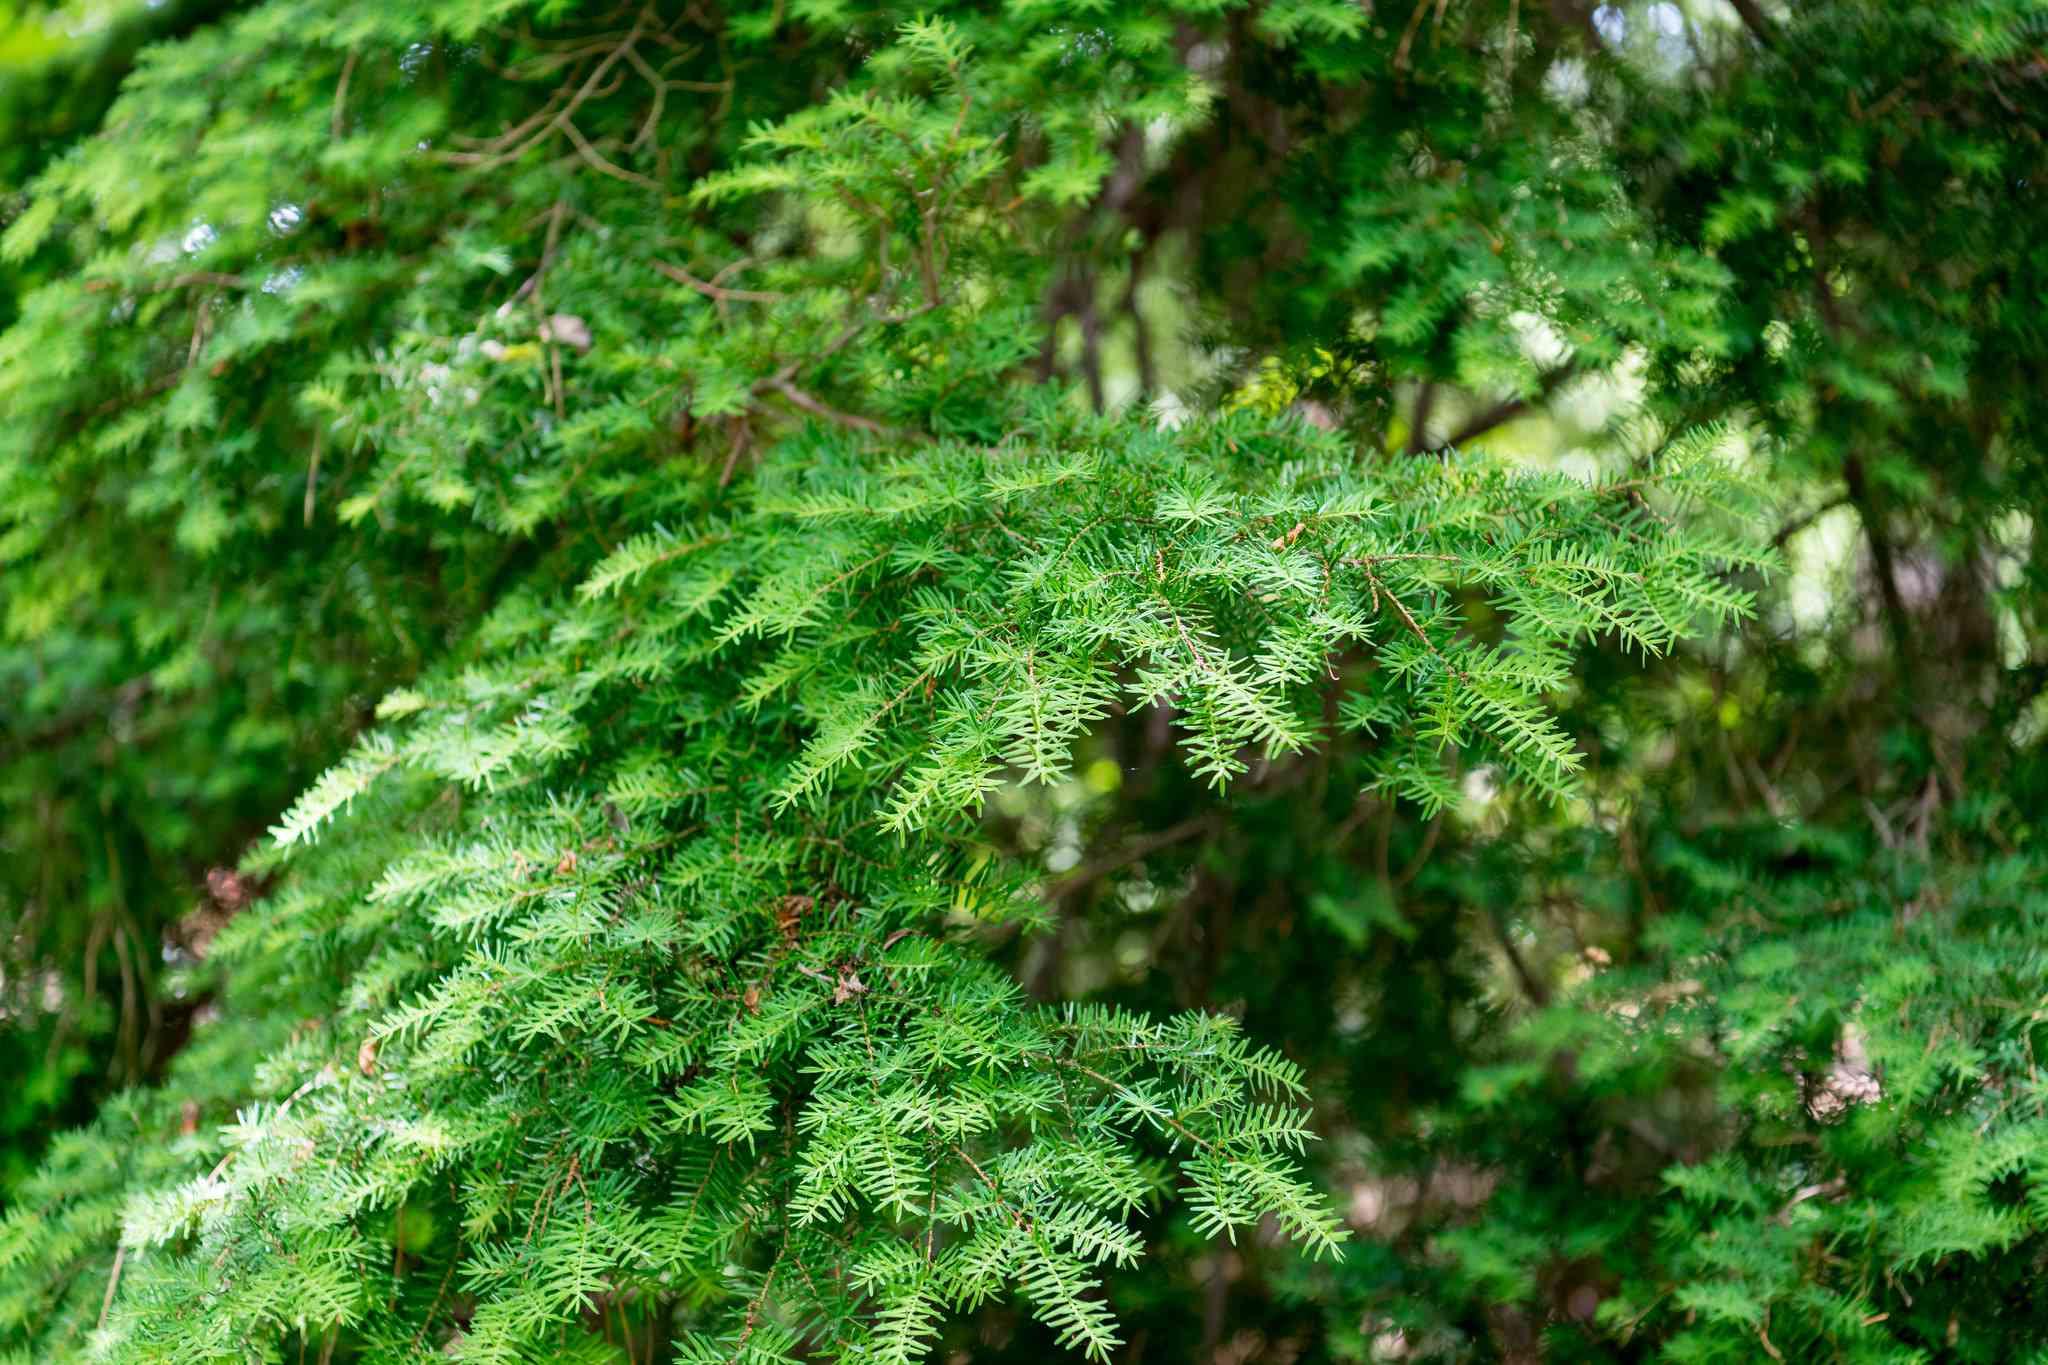 The branches of an evergreen Carolina Hemlock tree.